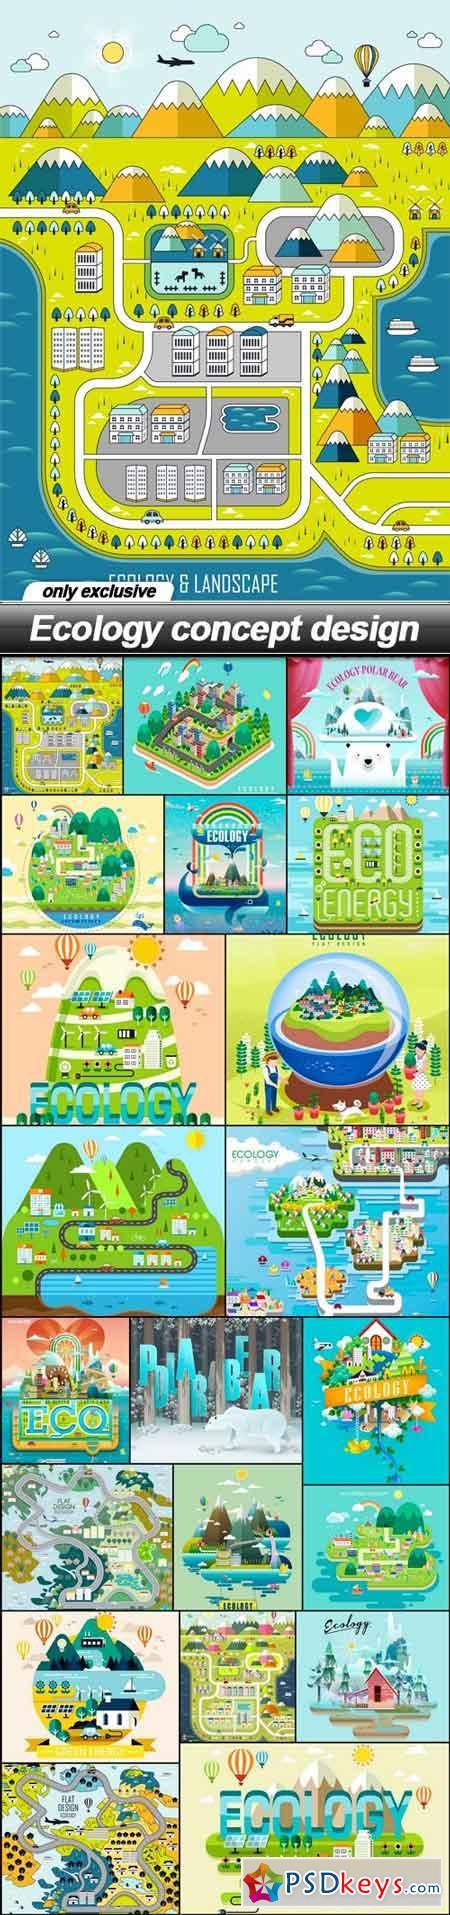 Ecology concept design - 21 EPS